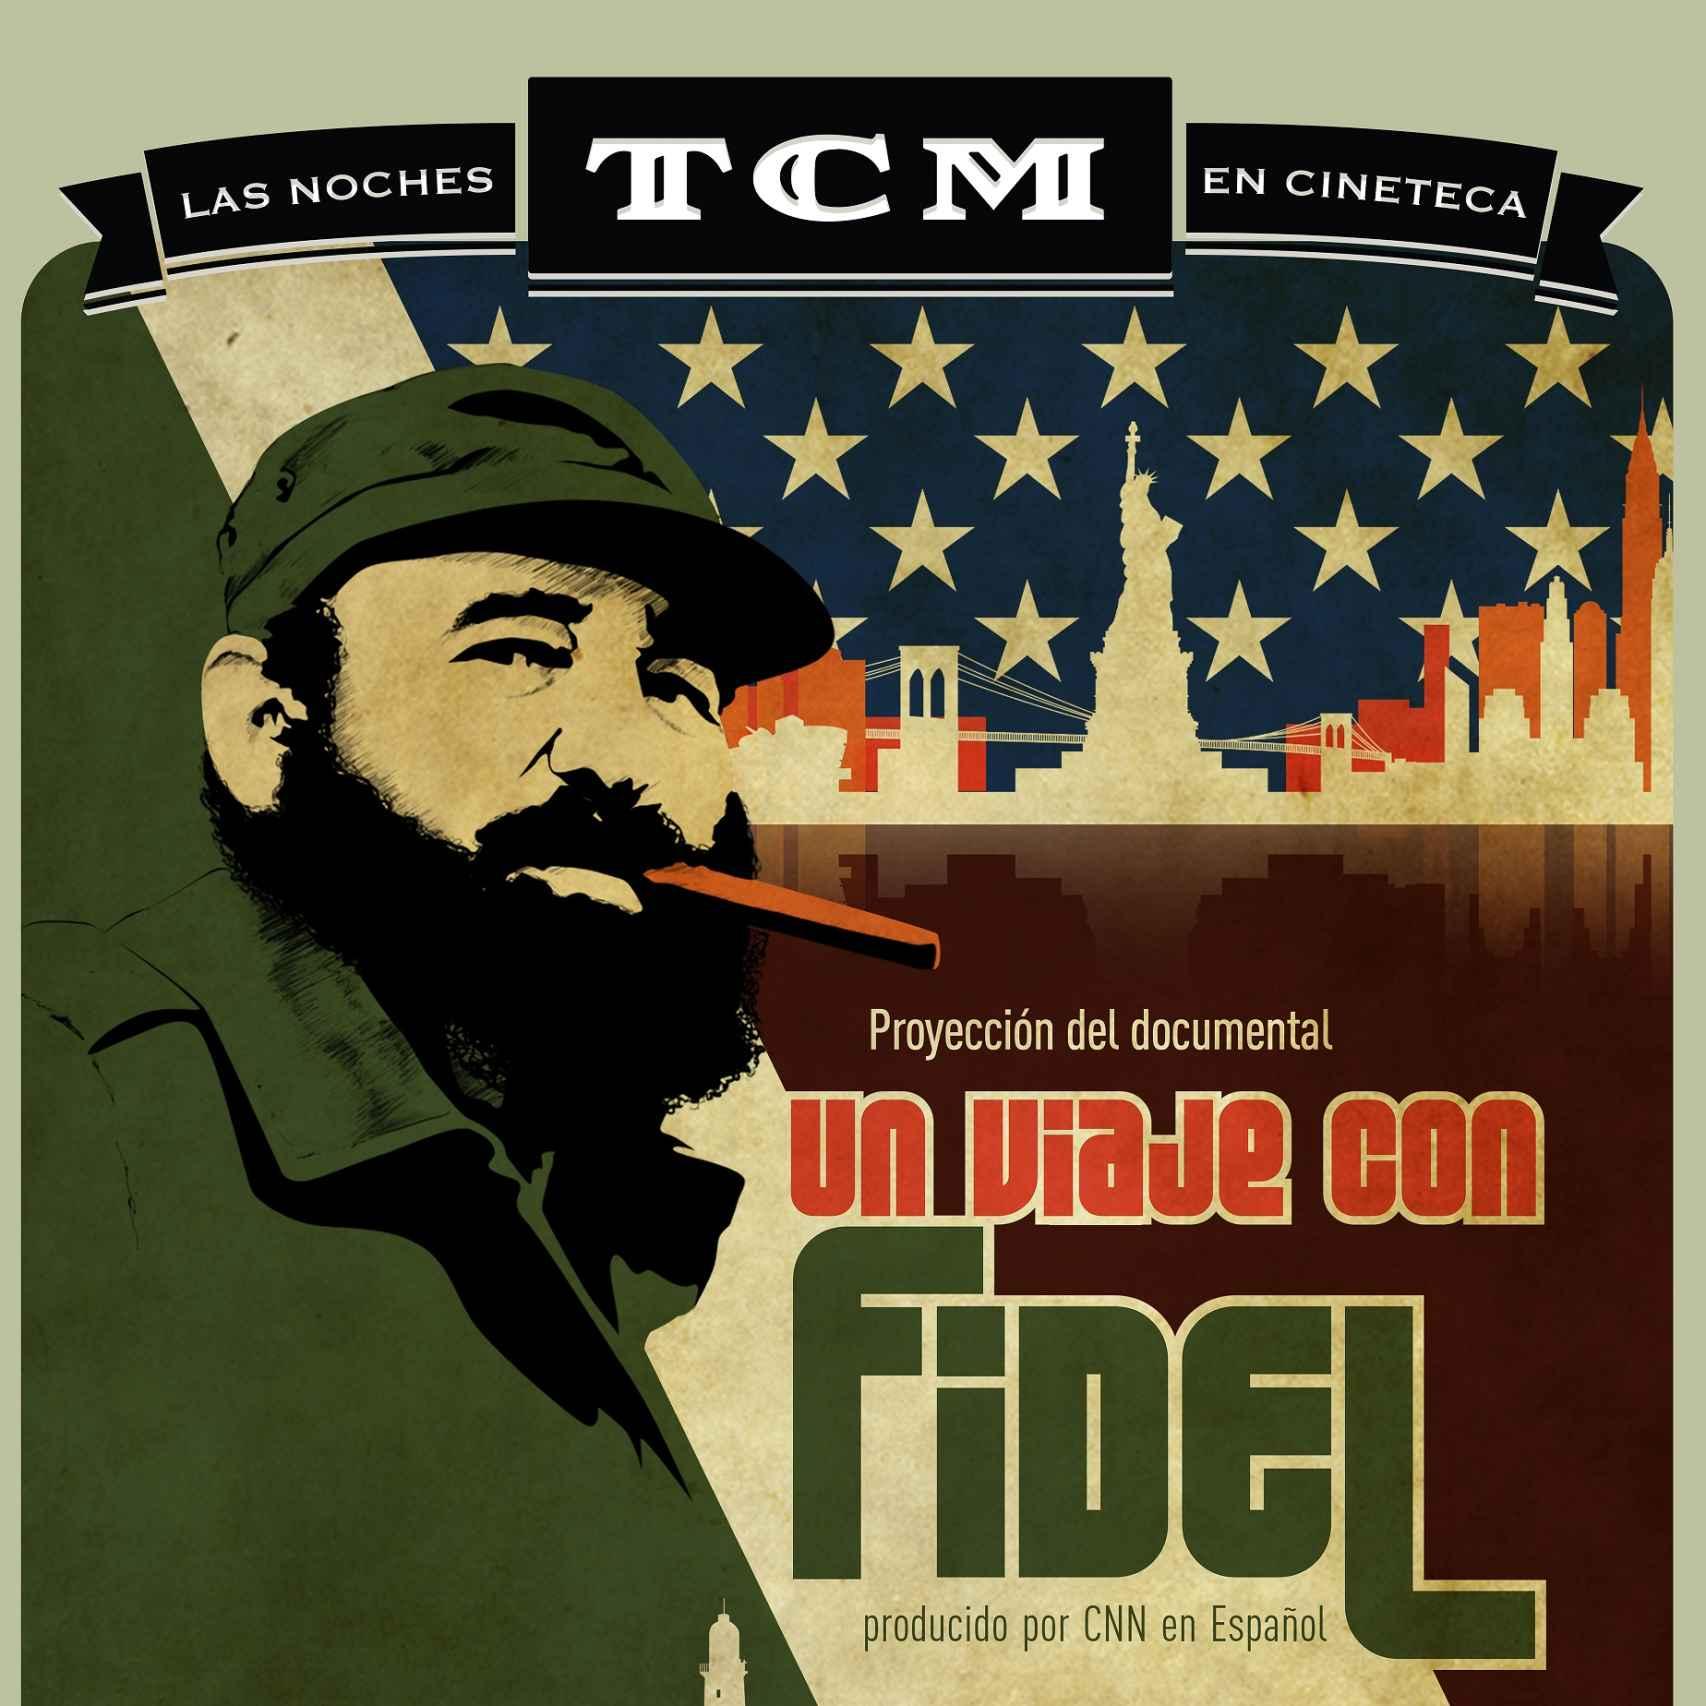 TCM_Un viaje con fidel_web